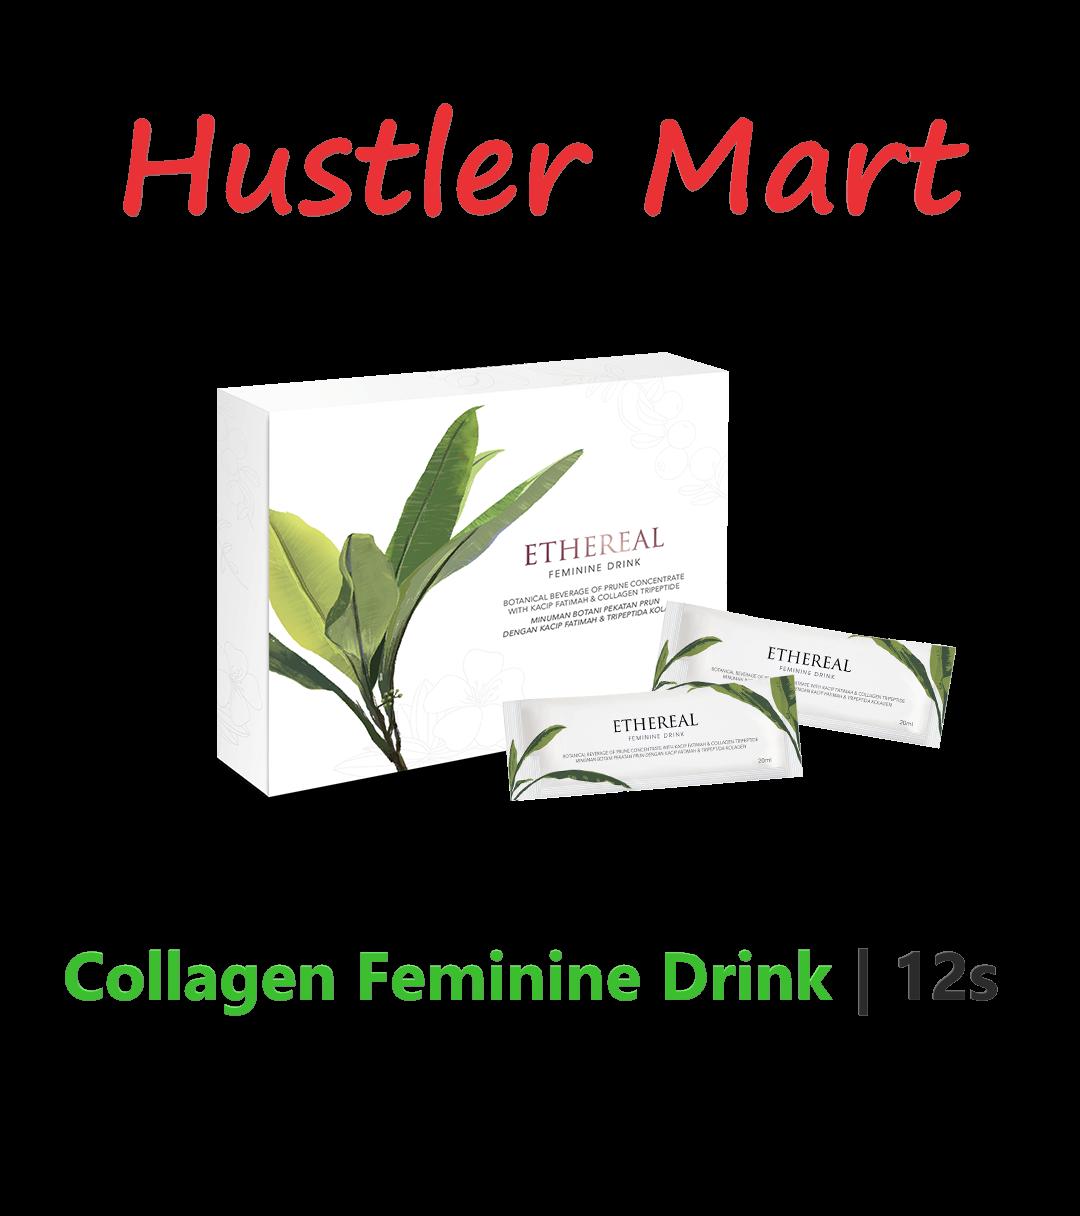 Ethereal Collagen Feminine Drink 12s